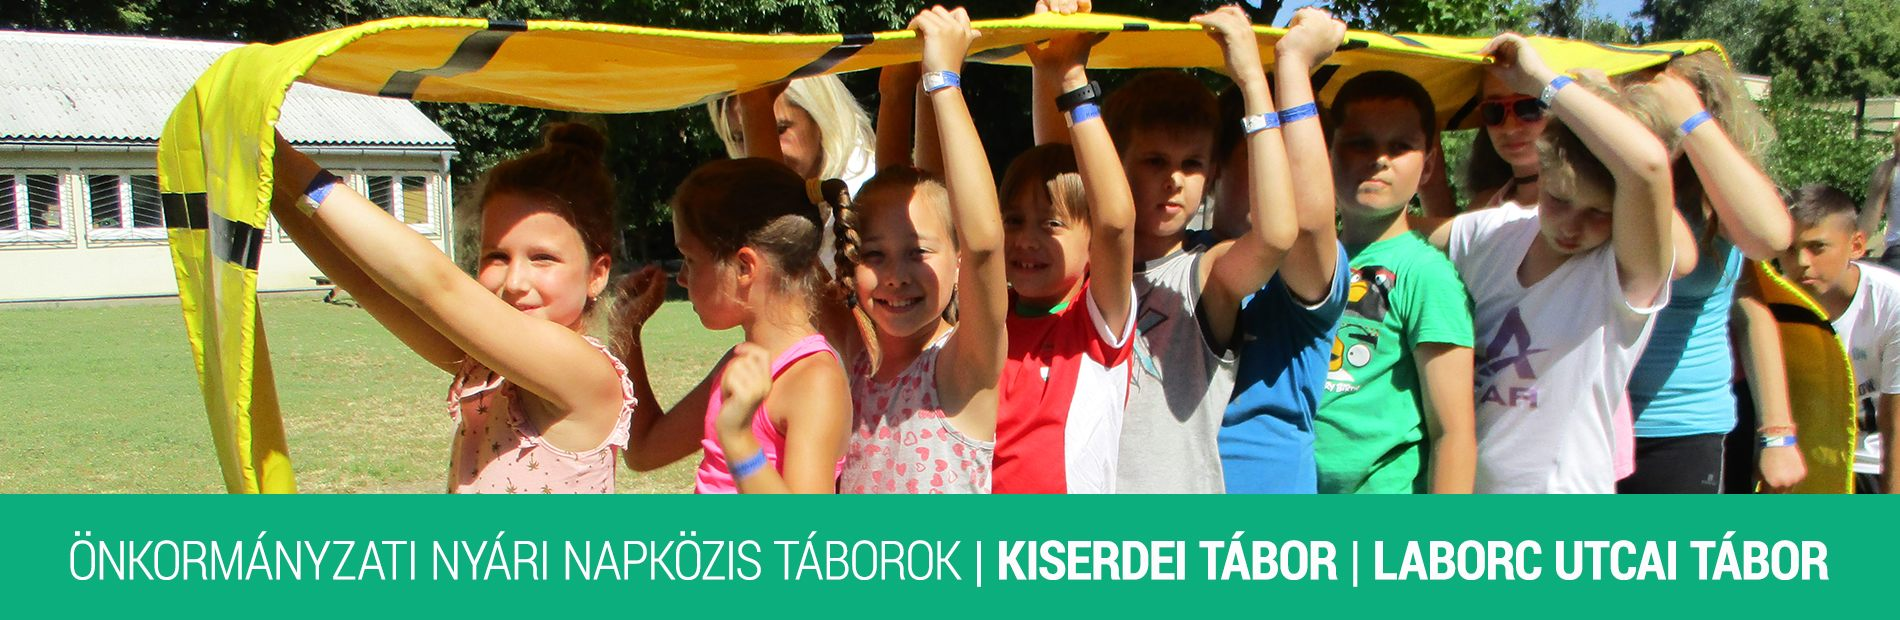 tabor_slider